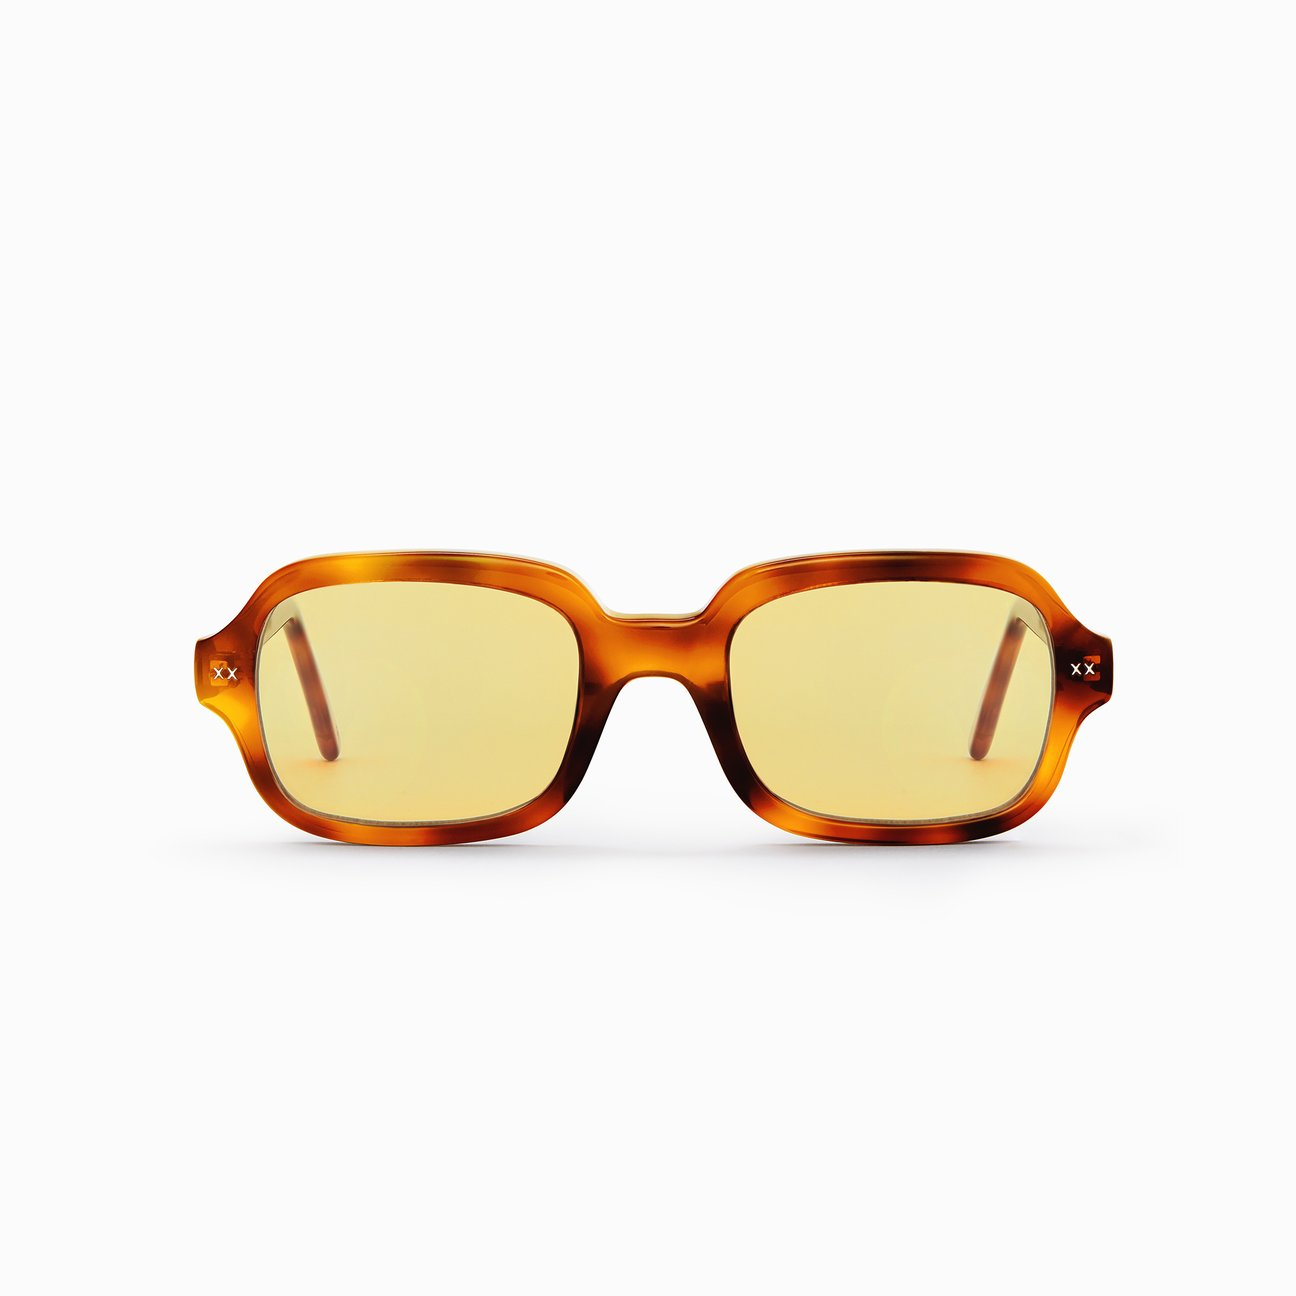 Jordy / Tortoise / Yellow by Lexxola, available on lexxola.com for EUR190 Chantel Jeffries Sunglasses Exact Product